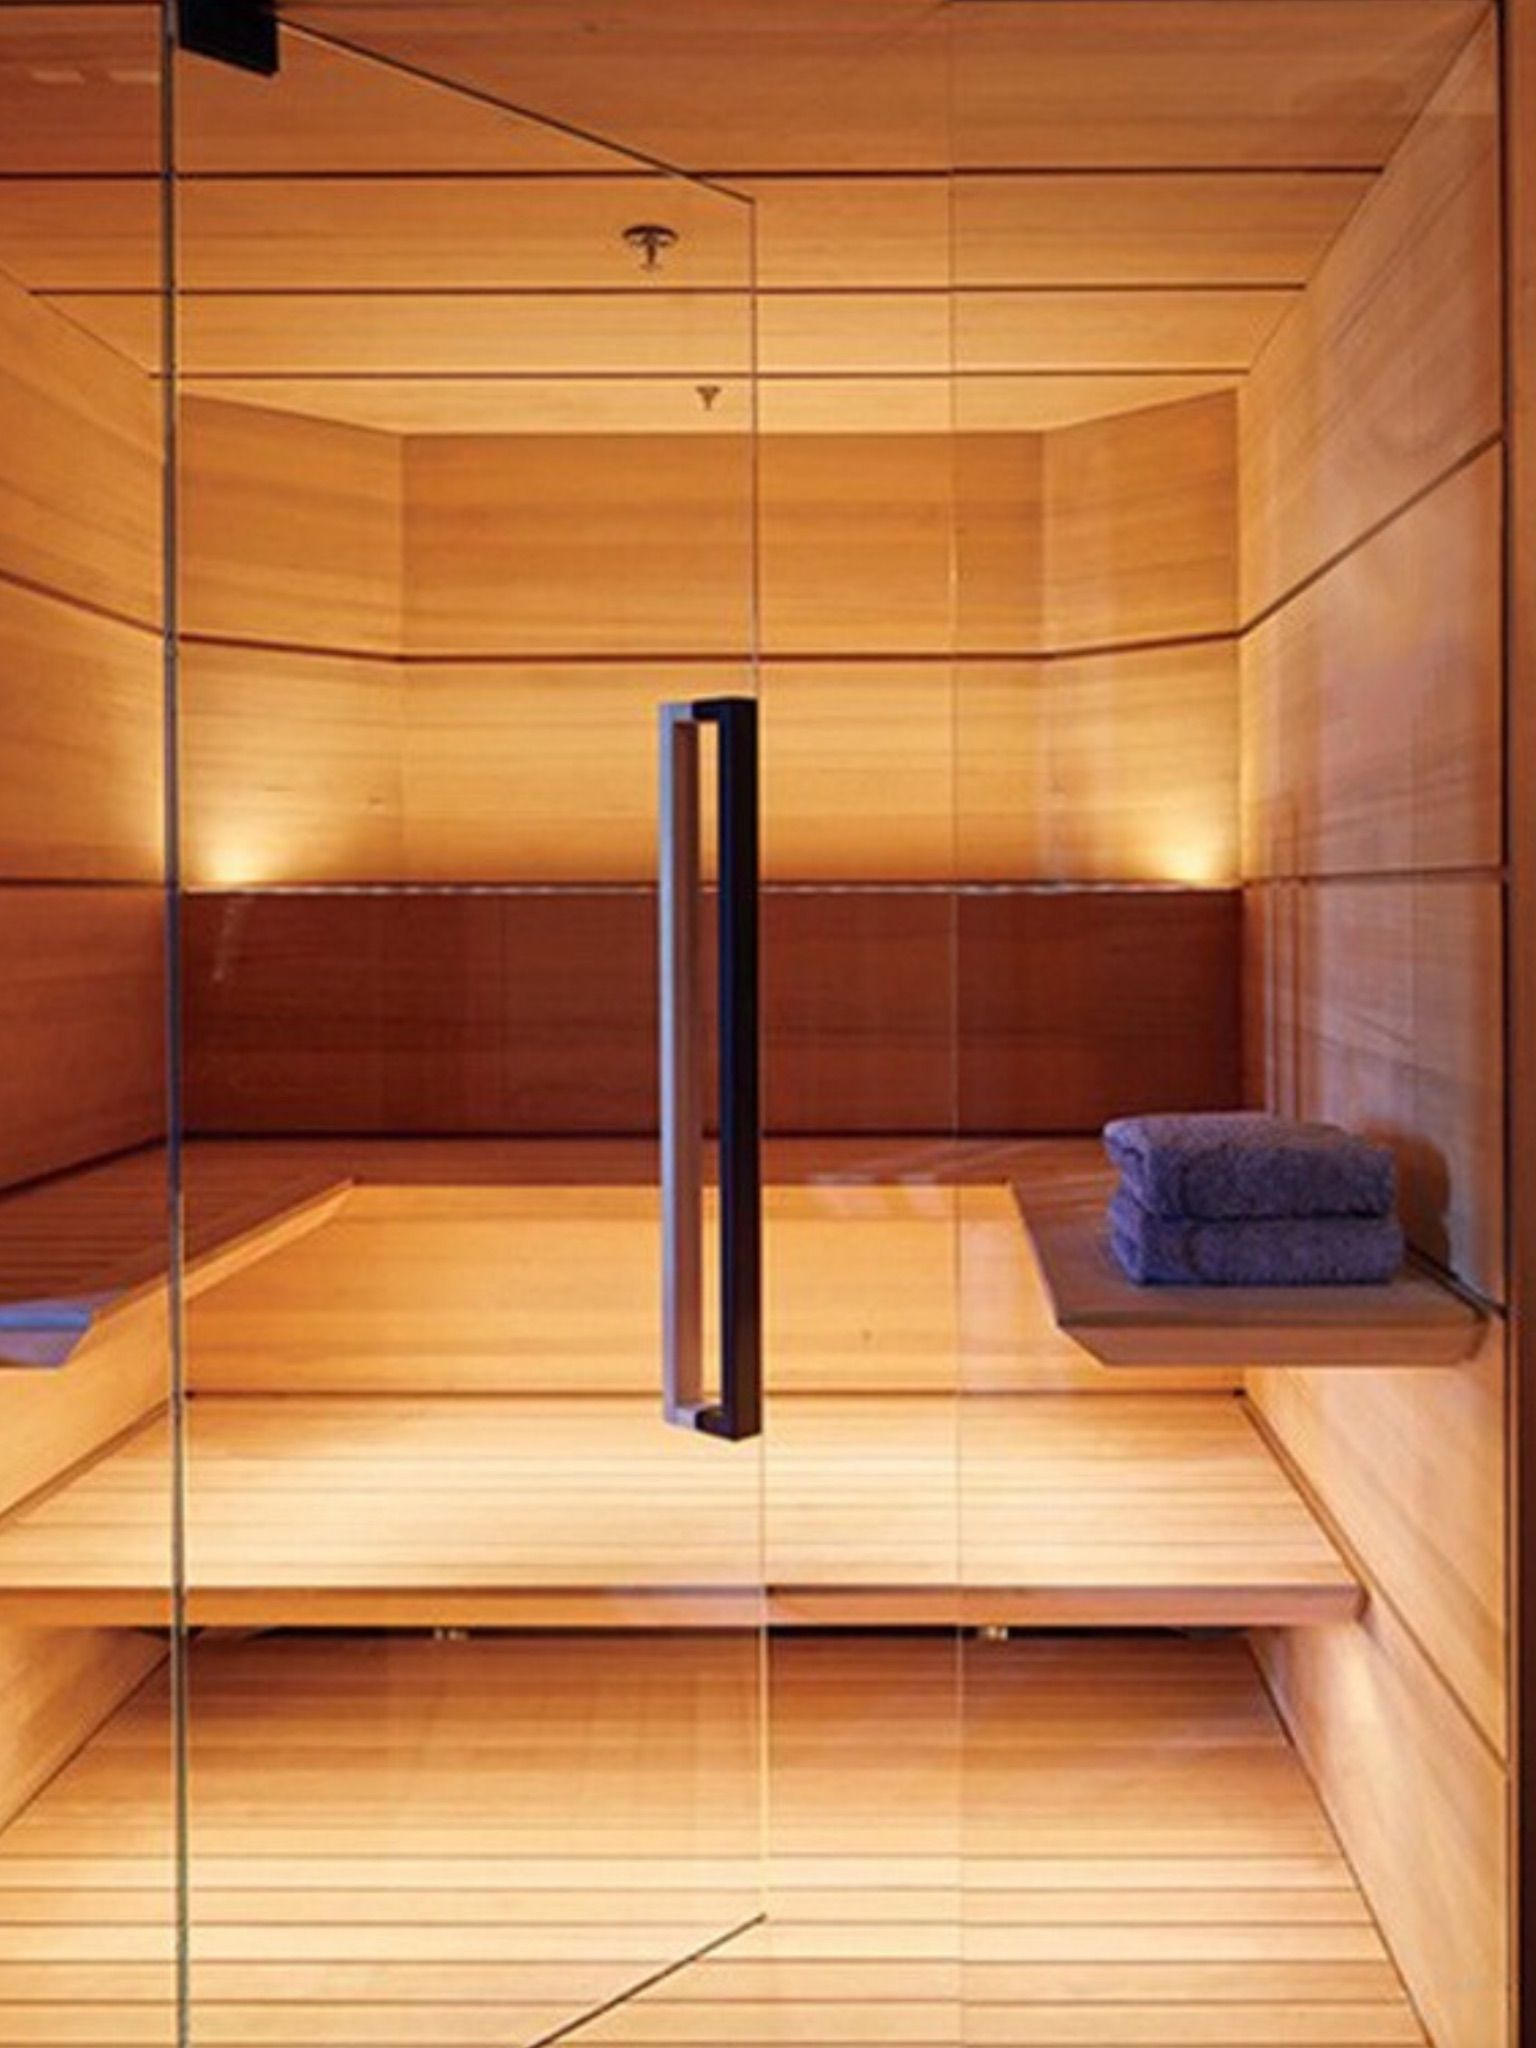 47 Coolest Home Sauna Design Ideas | Pinterest | Sauna design and Saunas